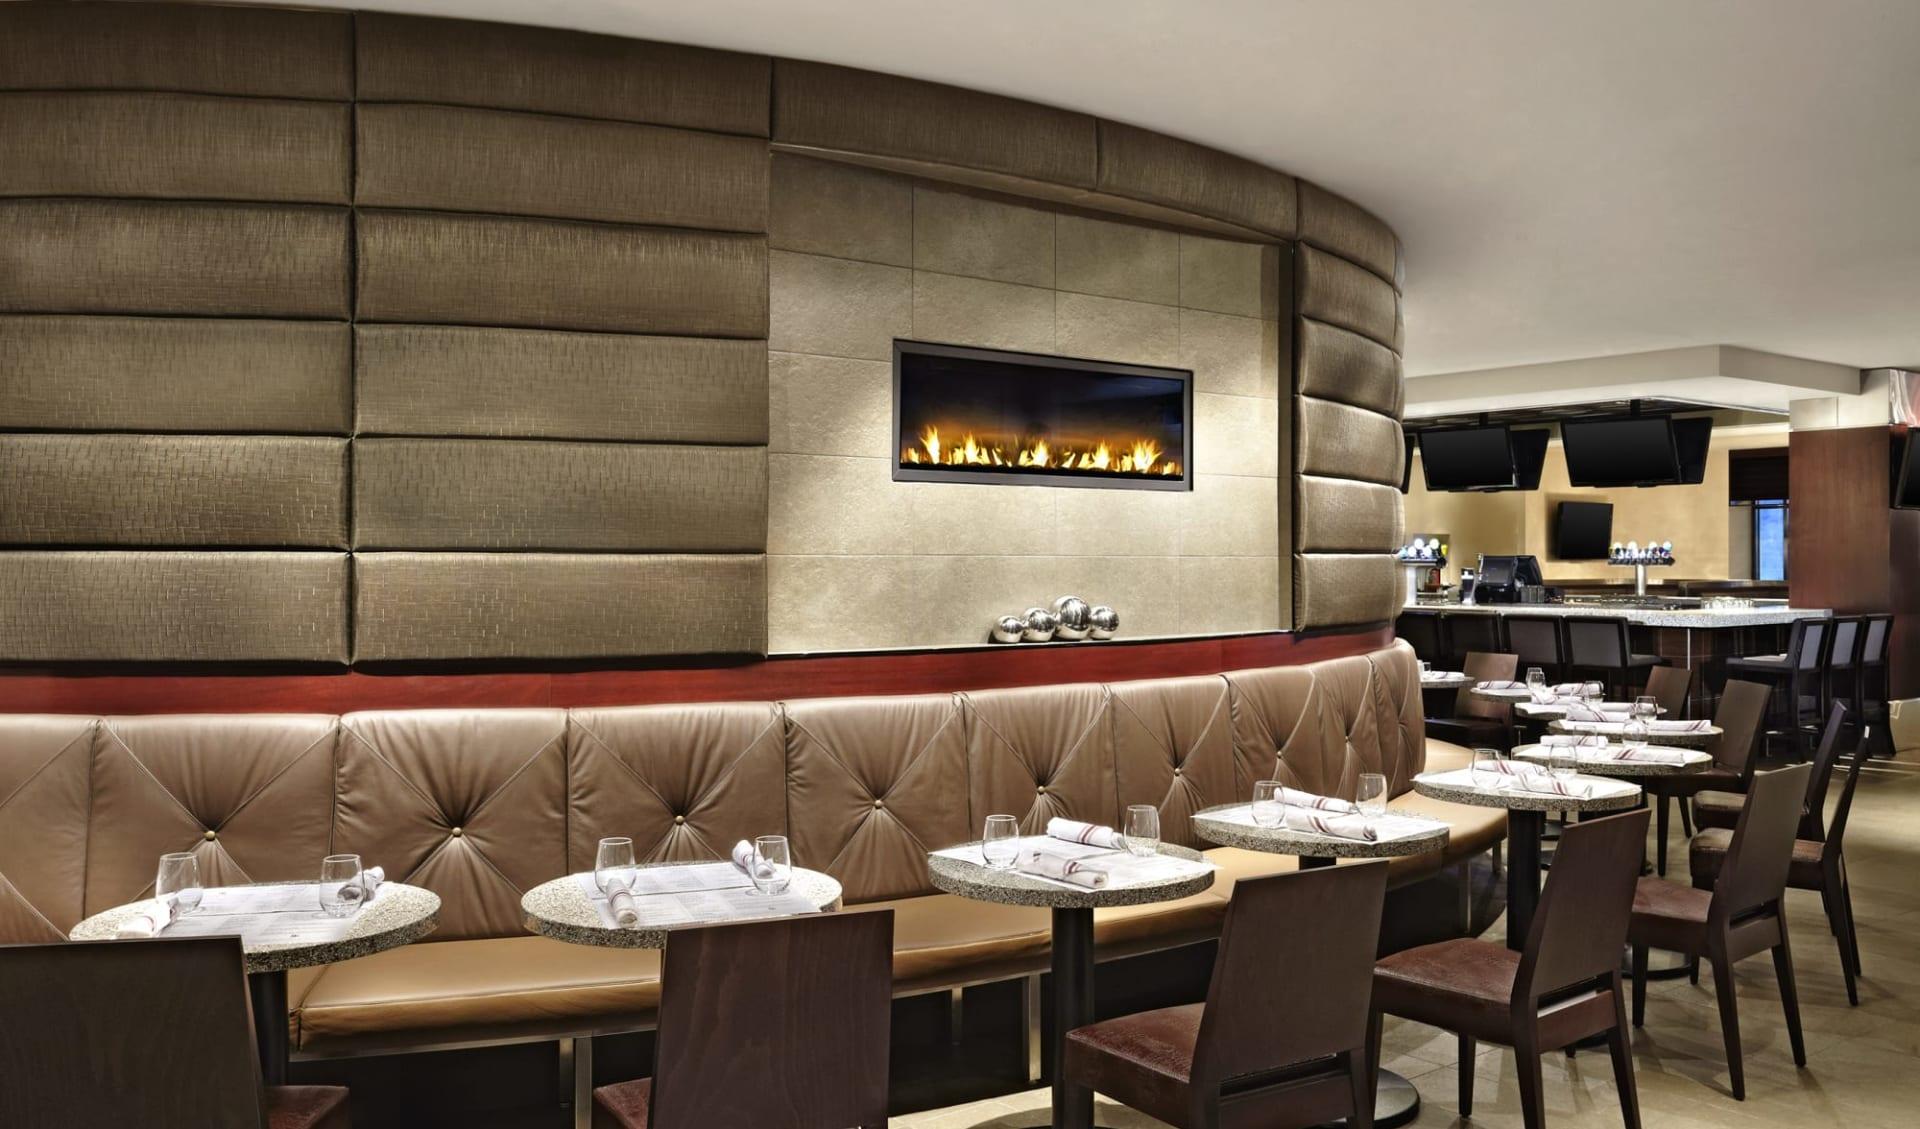 Sheraton Centre Hotel in Toronto:  Sheraton Centre Hotel & Towers_RestaurantLounge&BarArea